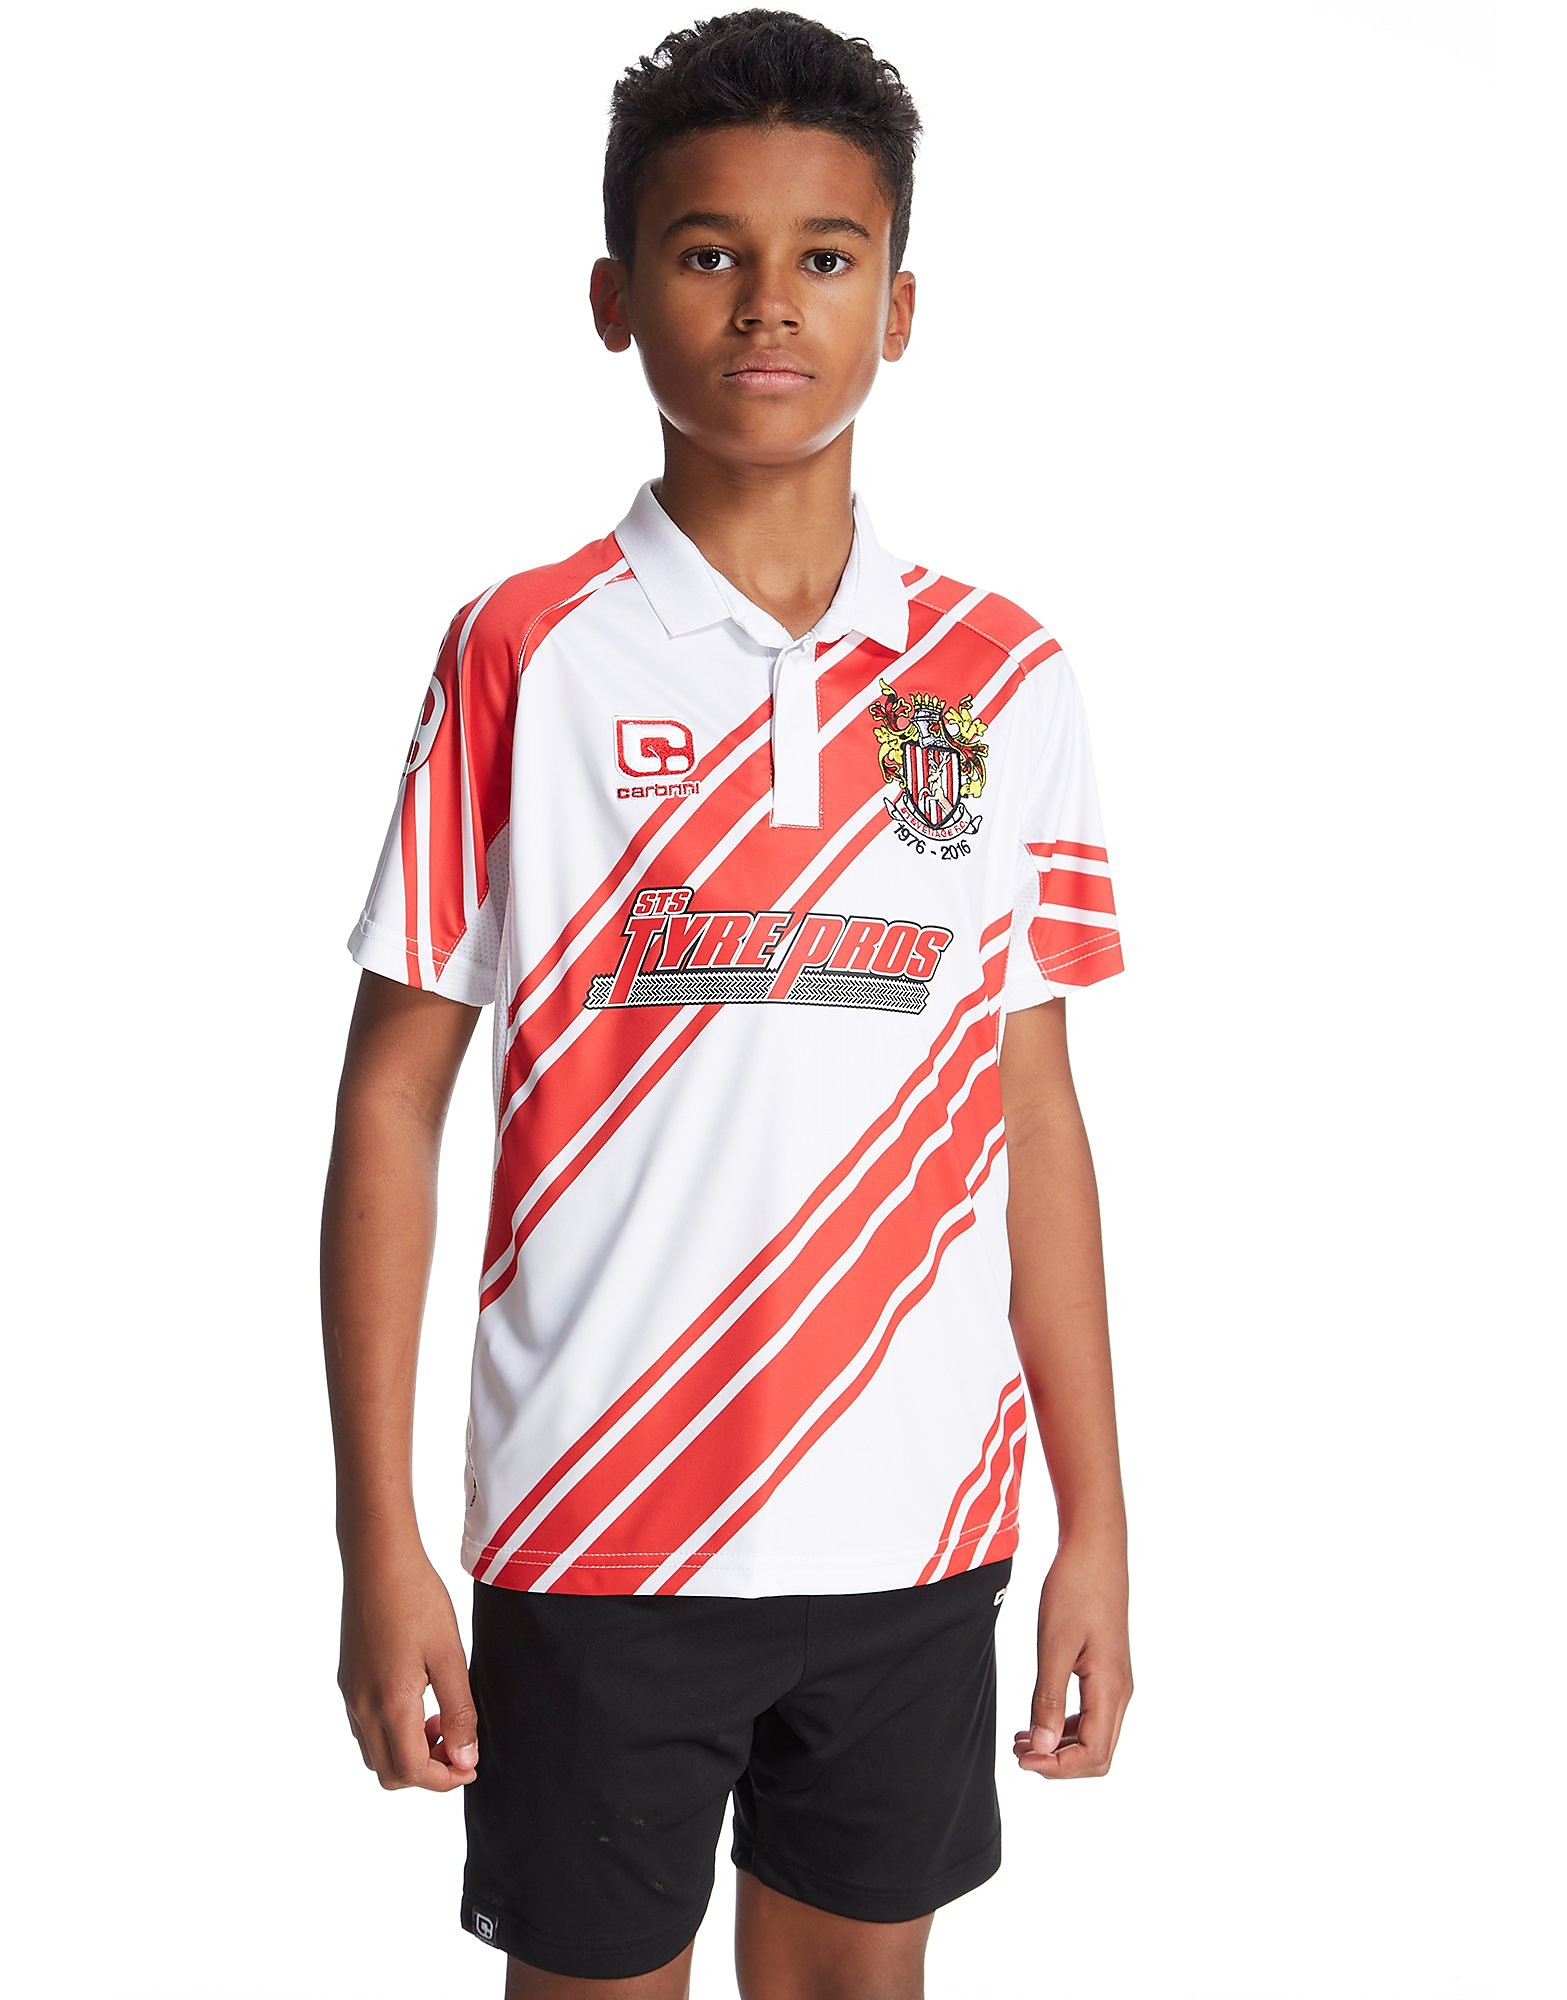 Carbrini Stevenage FC 2016/17 Heimtrikot für Kinder